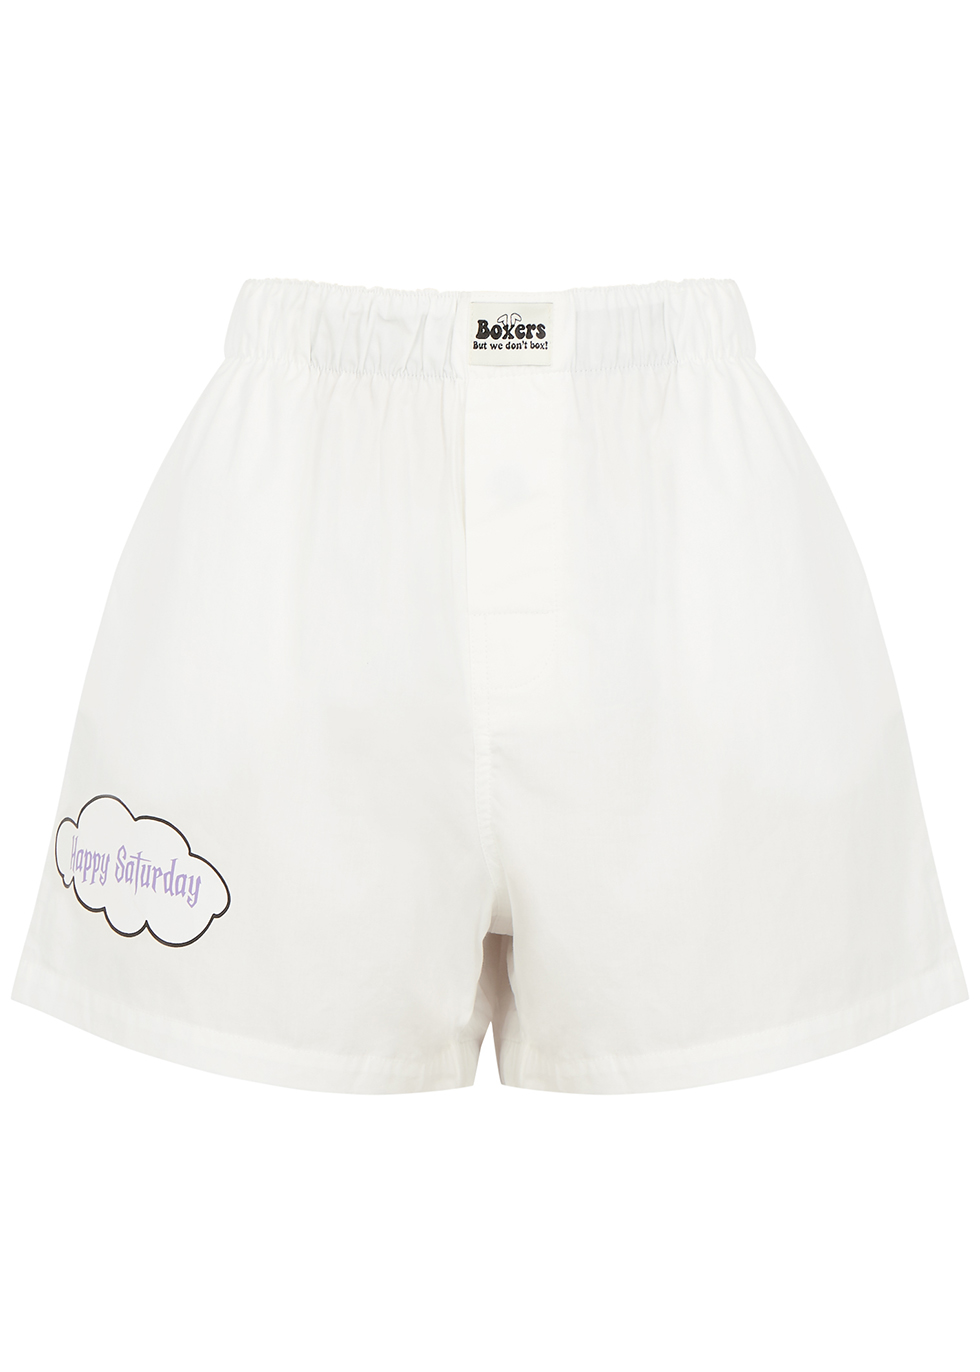 X DUO Happy Saturday white cotton shorts